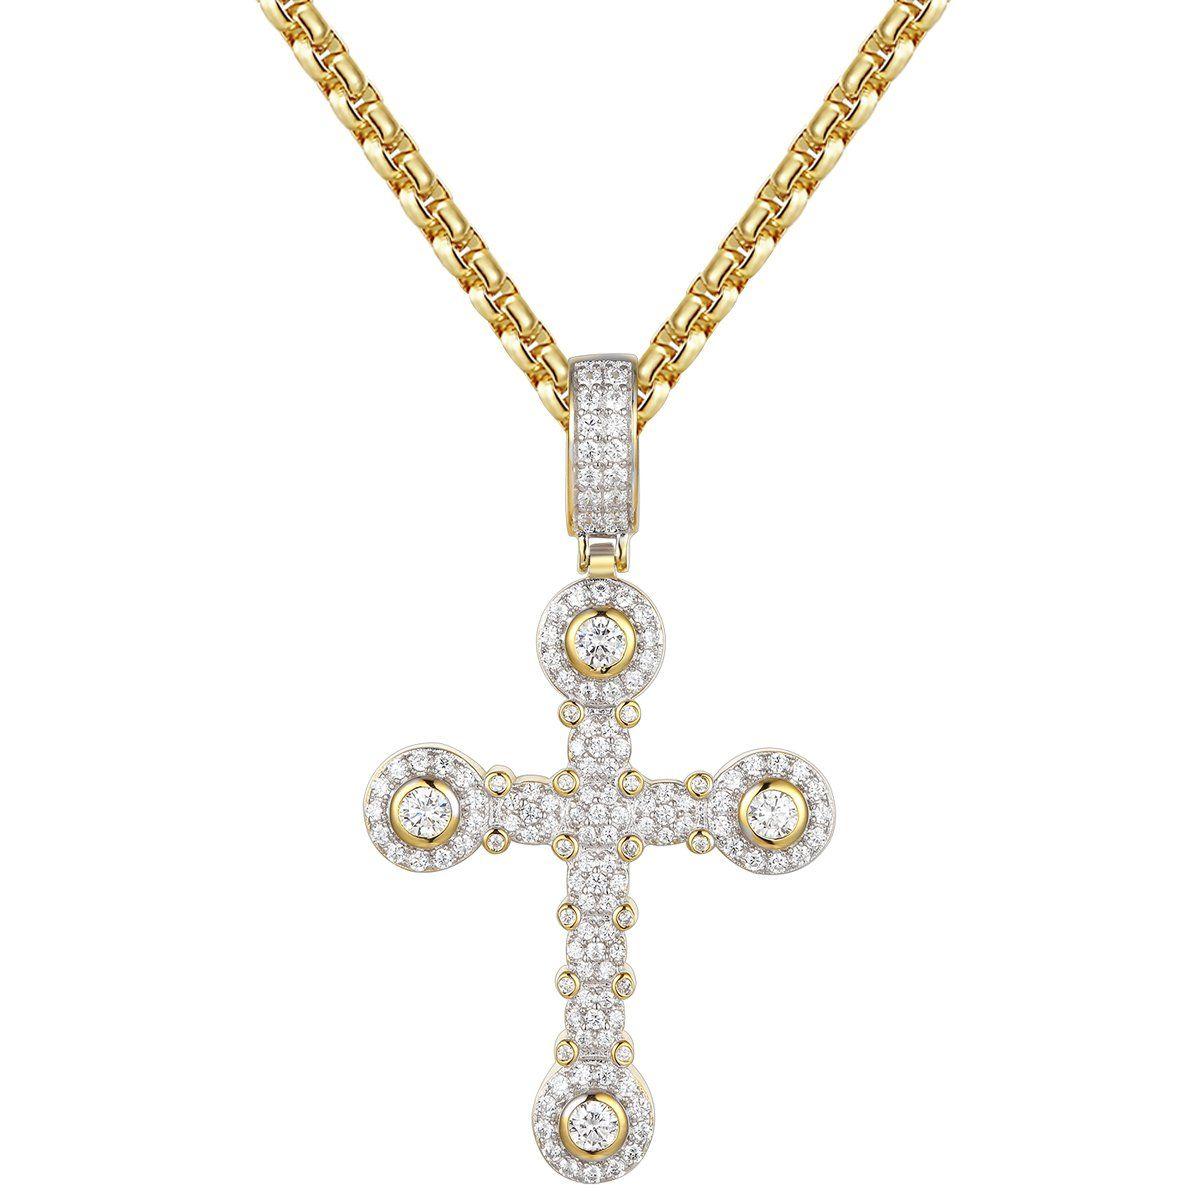 Solitaire cluster custom silver cross pendant necklace pendants solitaire cluster custom silver cross pendant necklace aloadofball Image collections